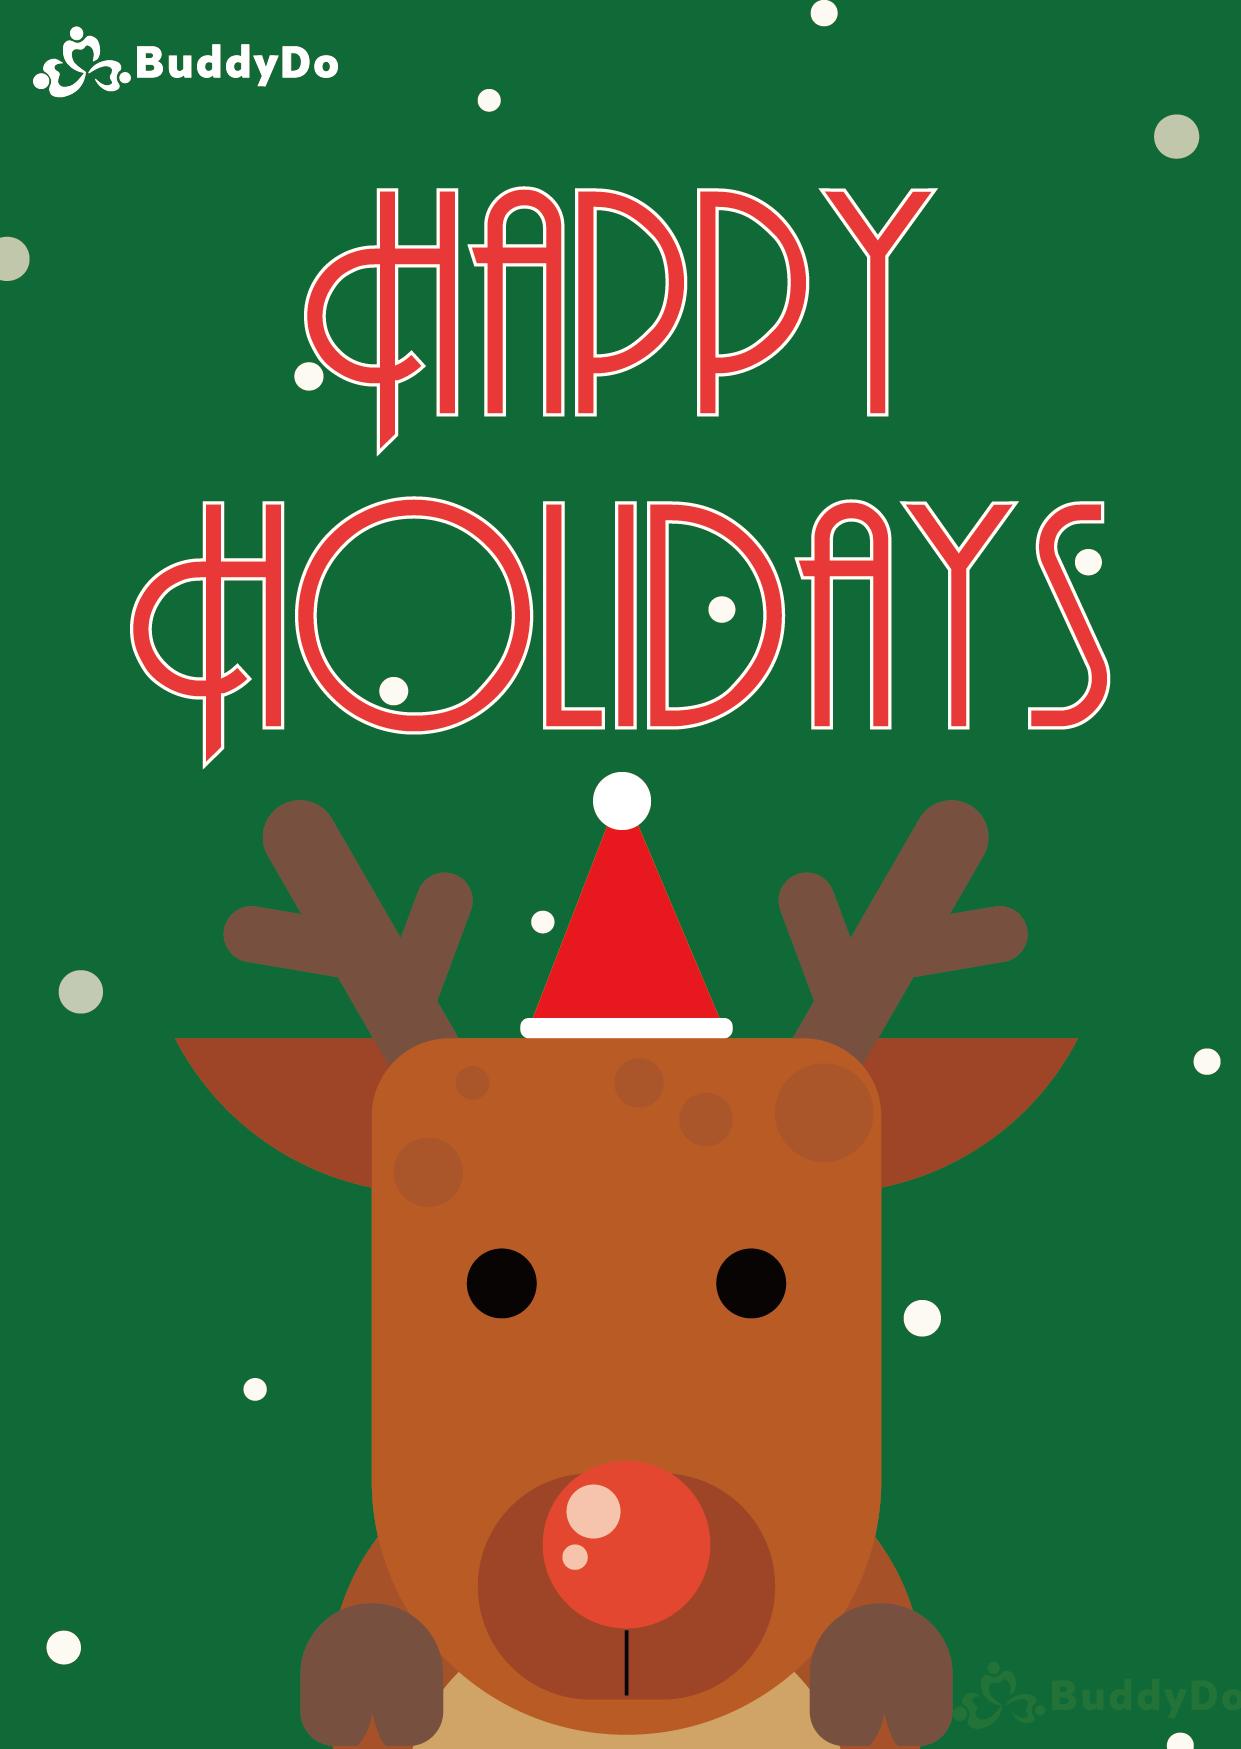 BuddyDo Christmas